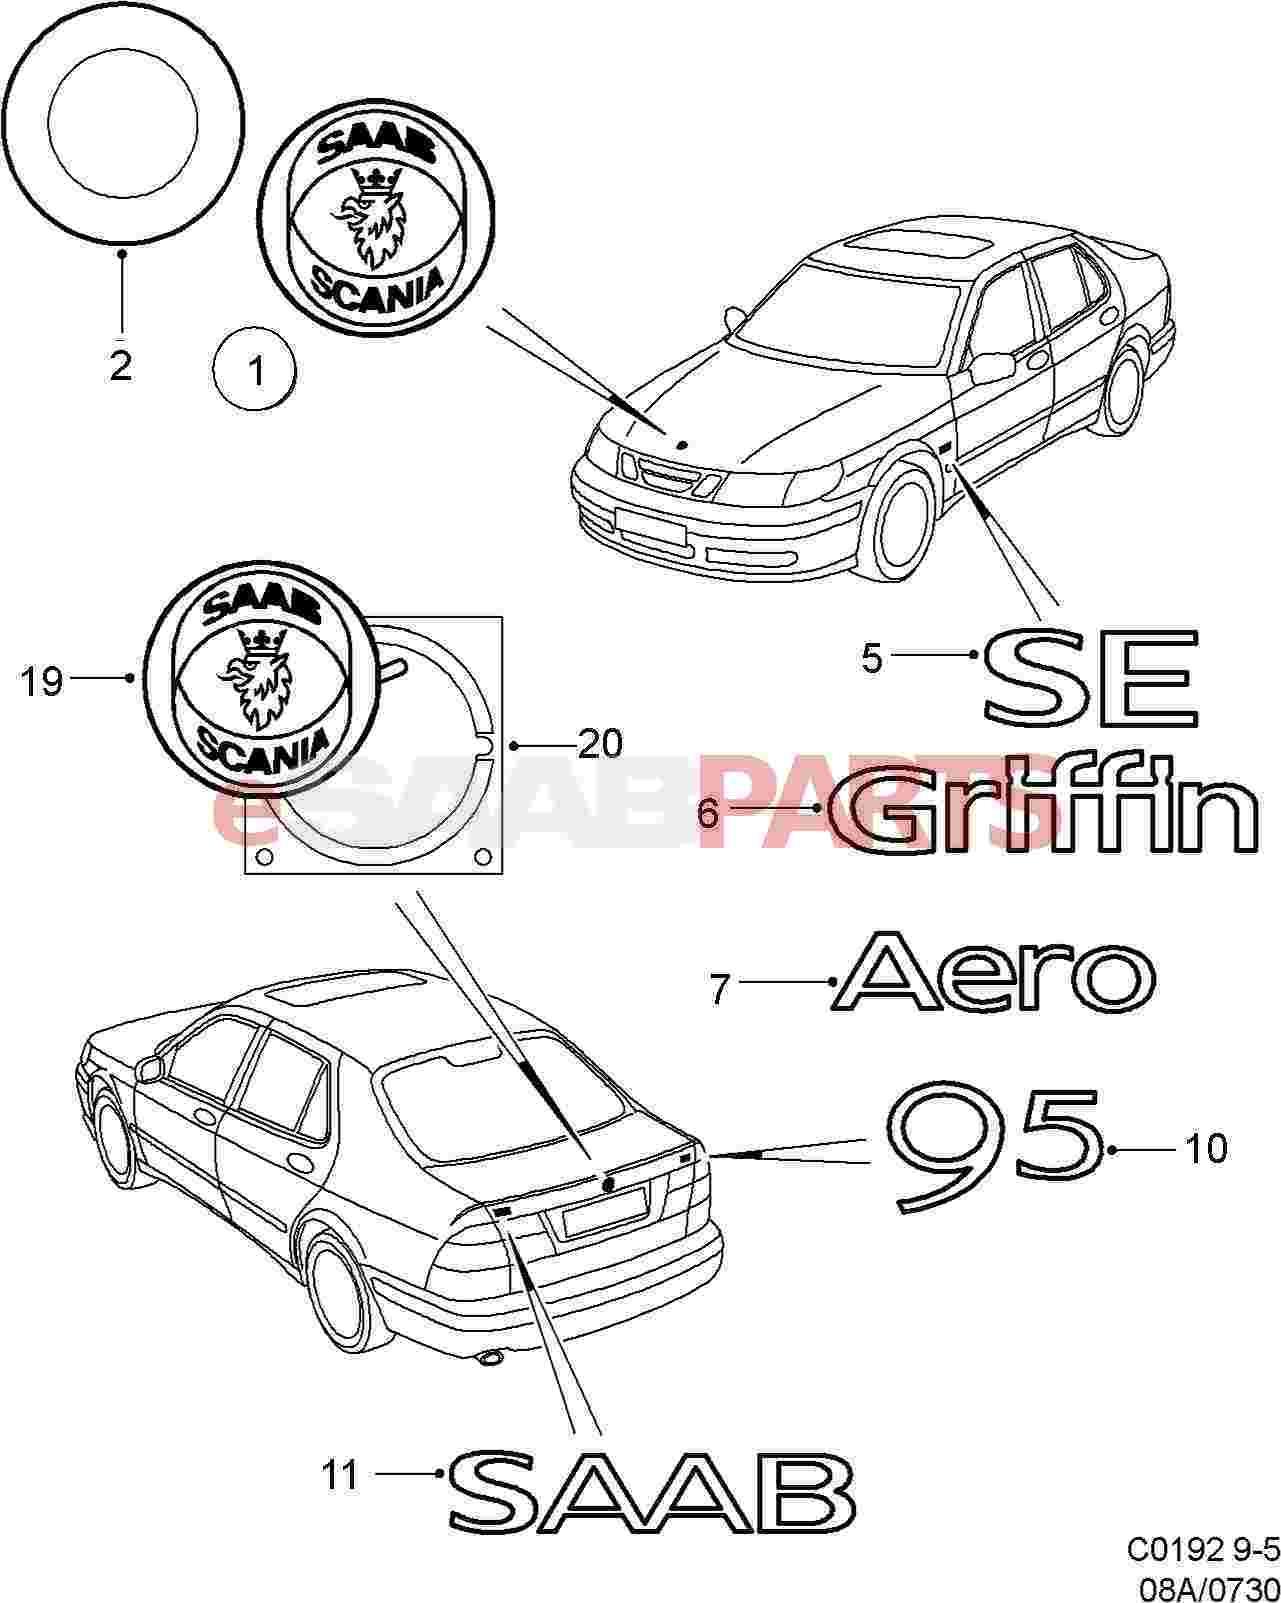 Saab Hood Emblem Badge Front Saab Griffin